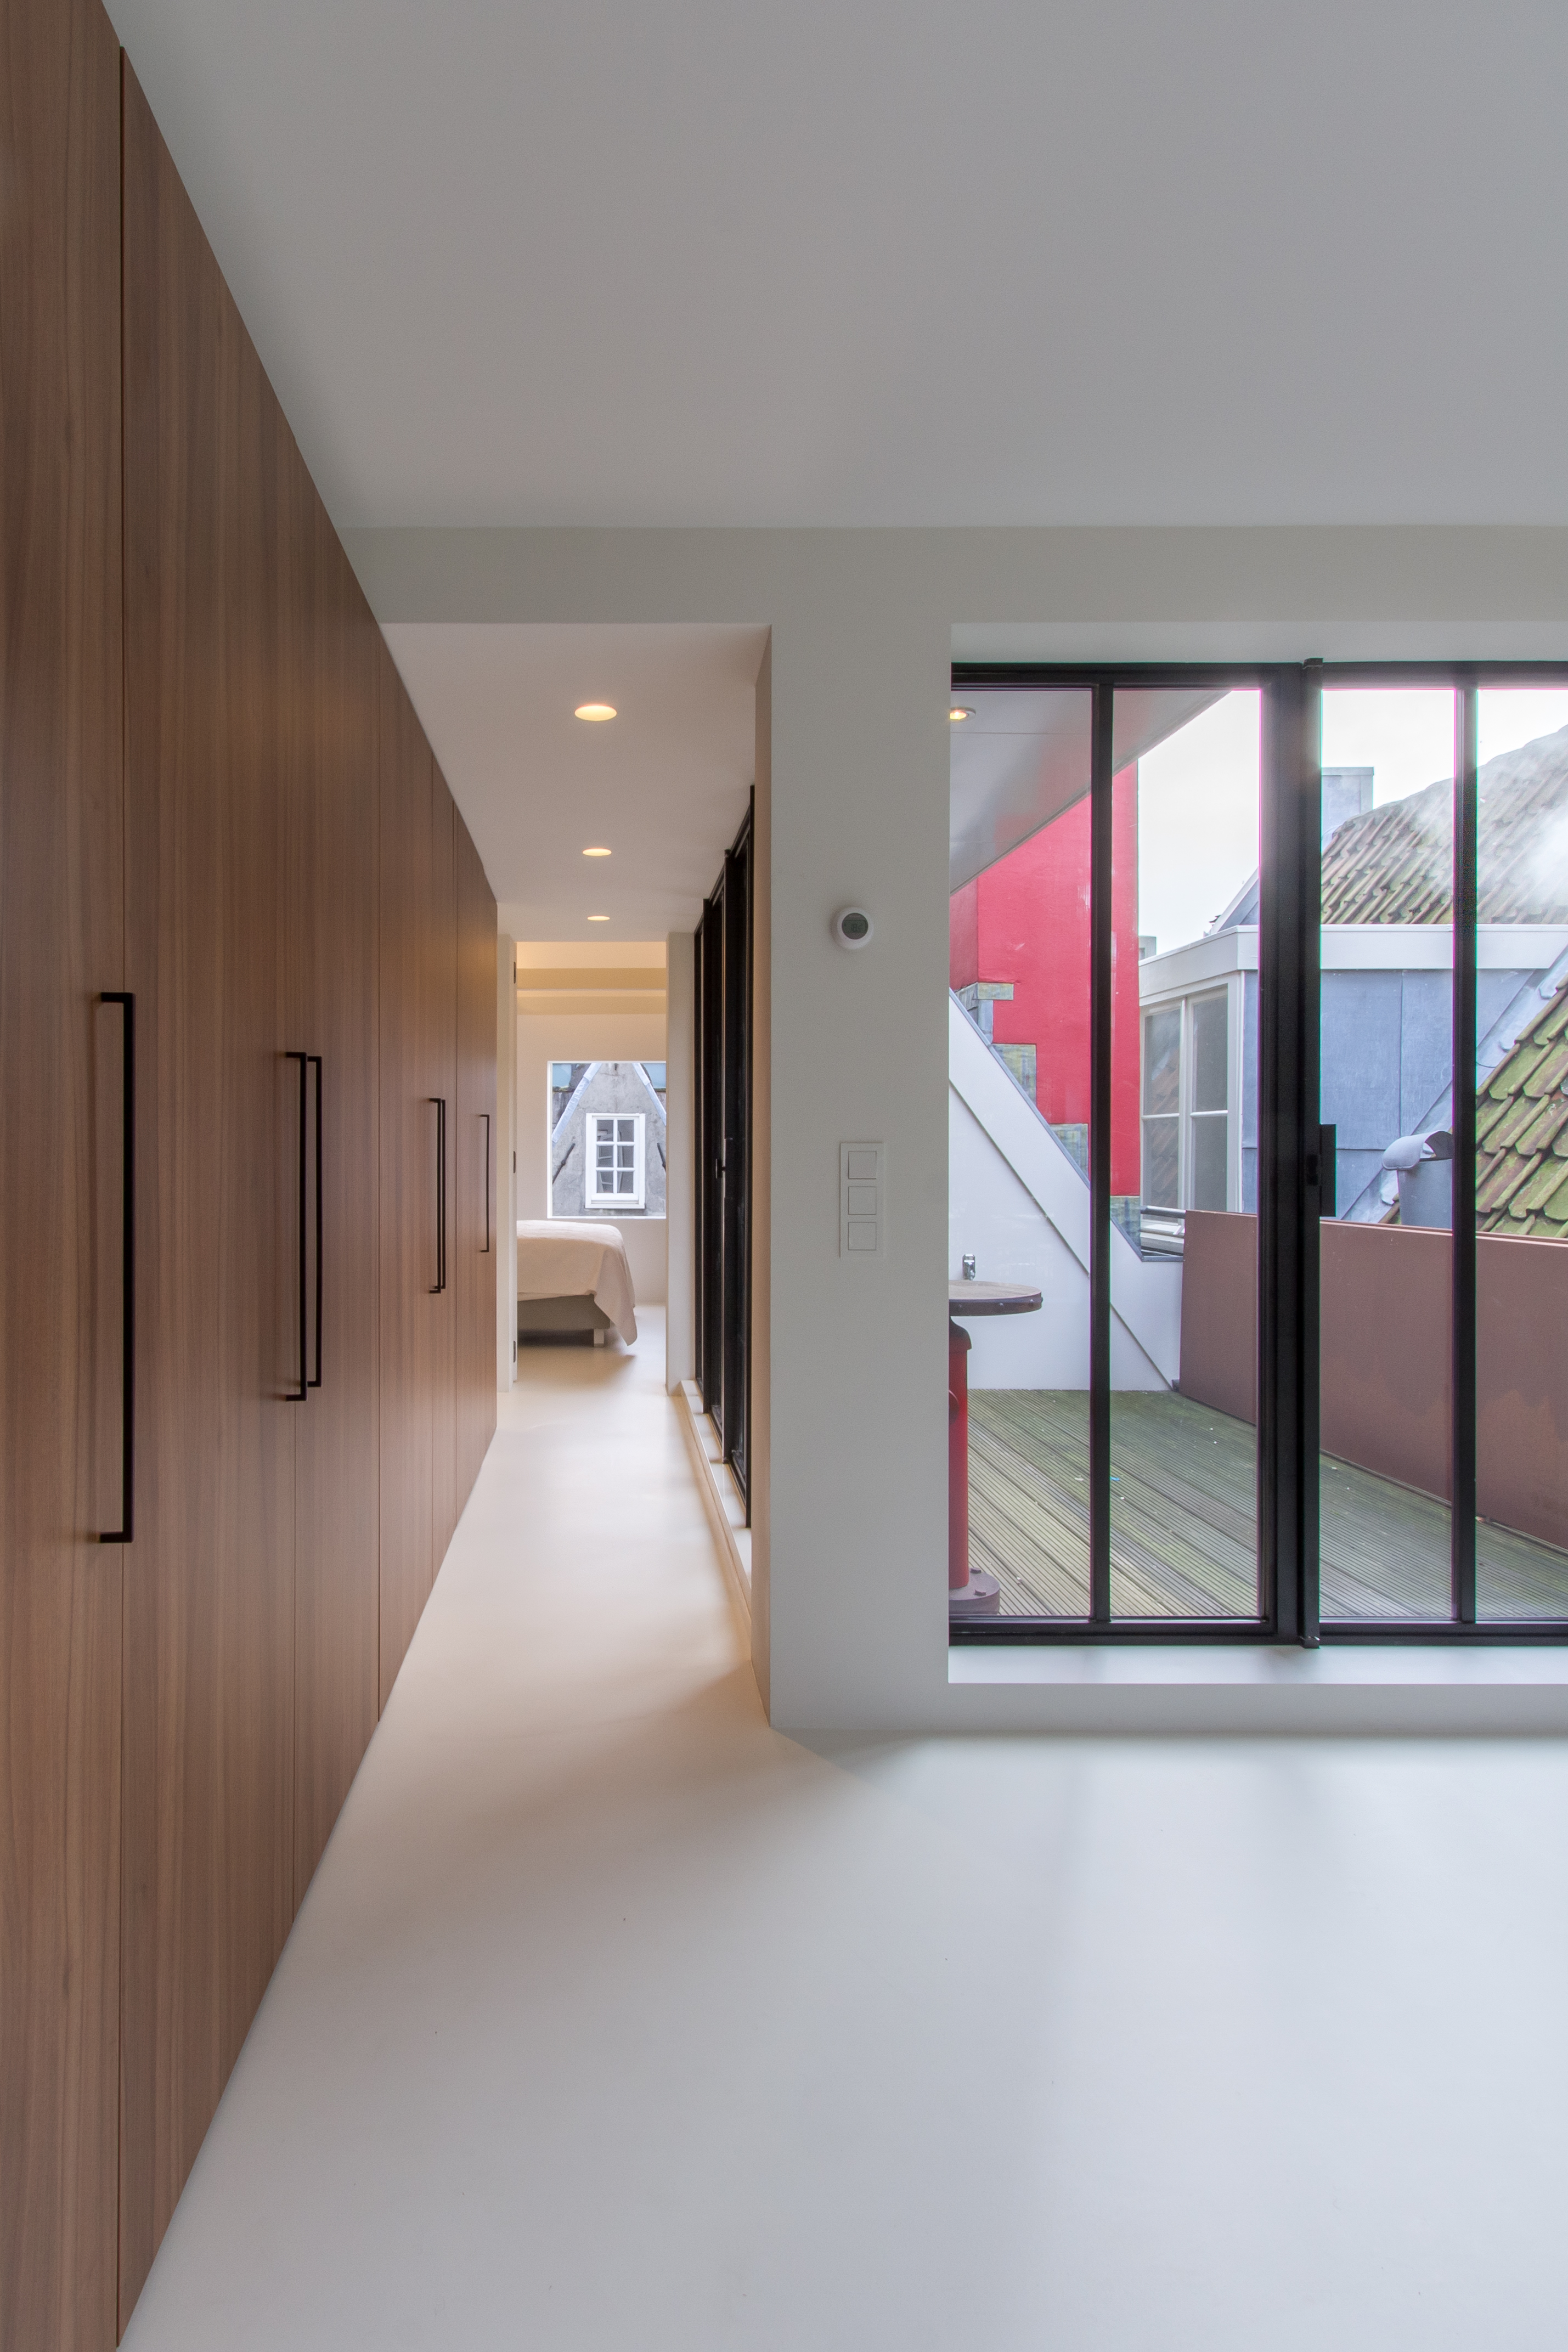 <p>Peter van der Knoop Architectuurfotografie</p>